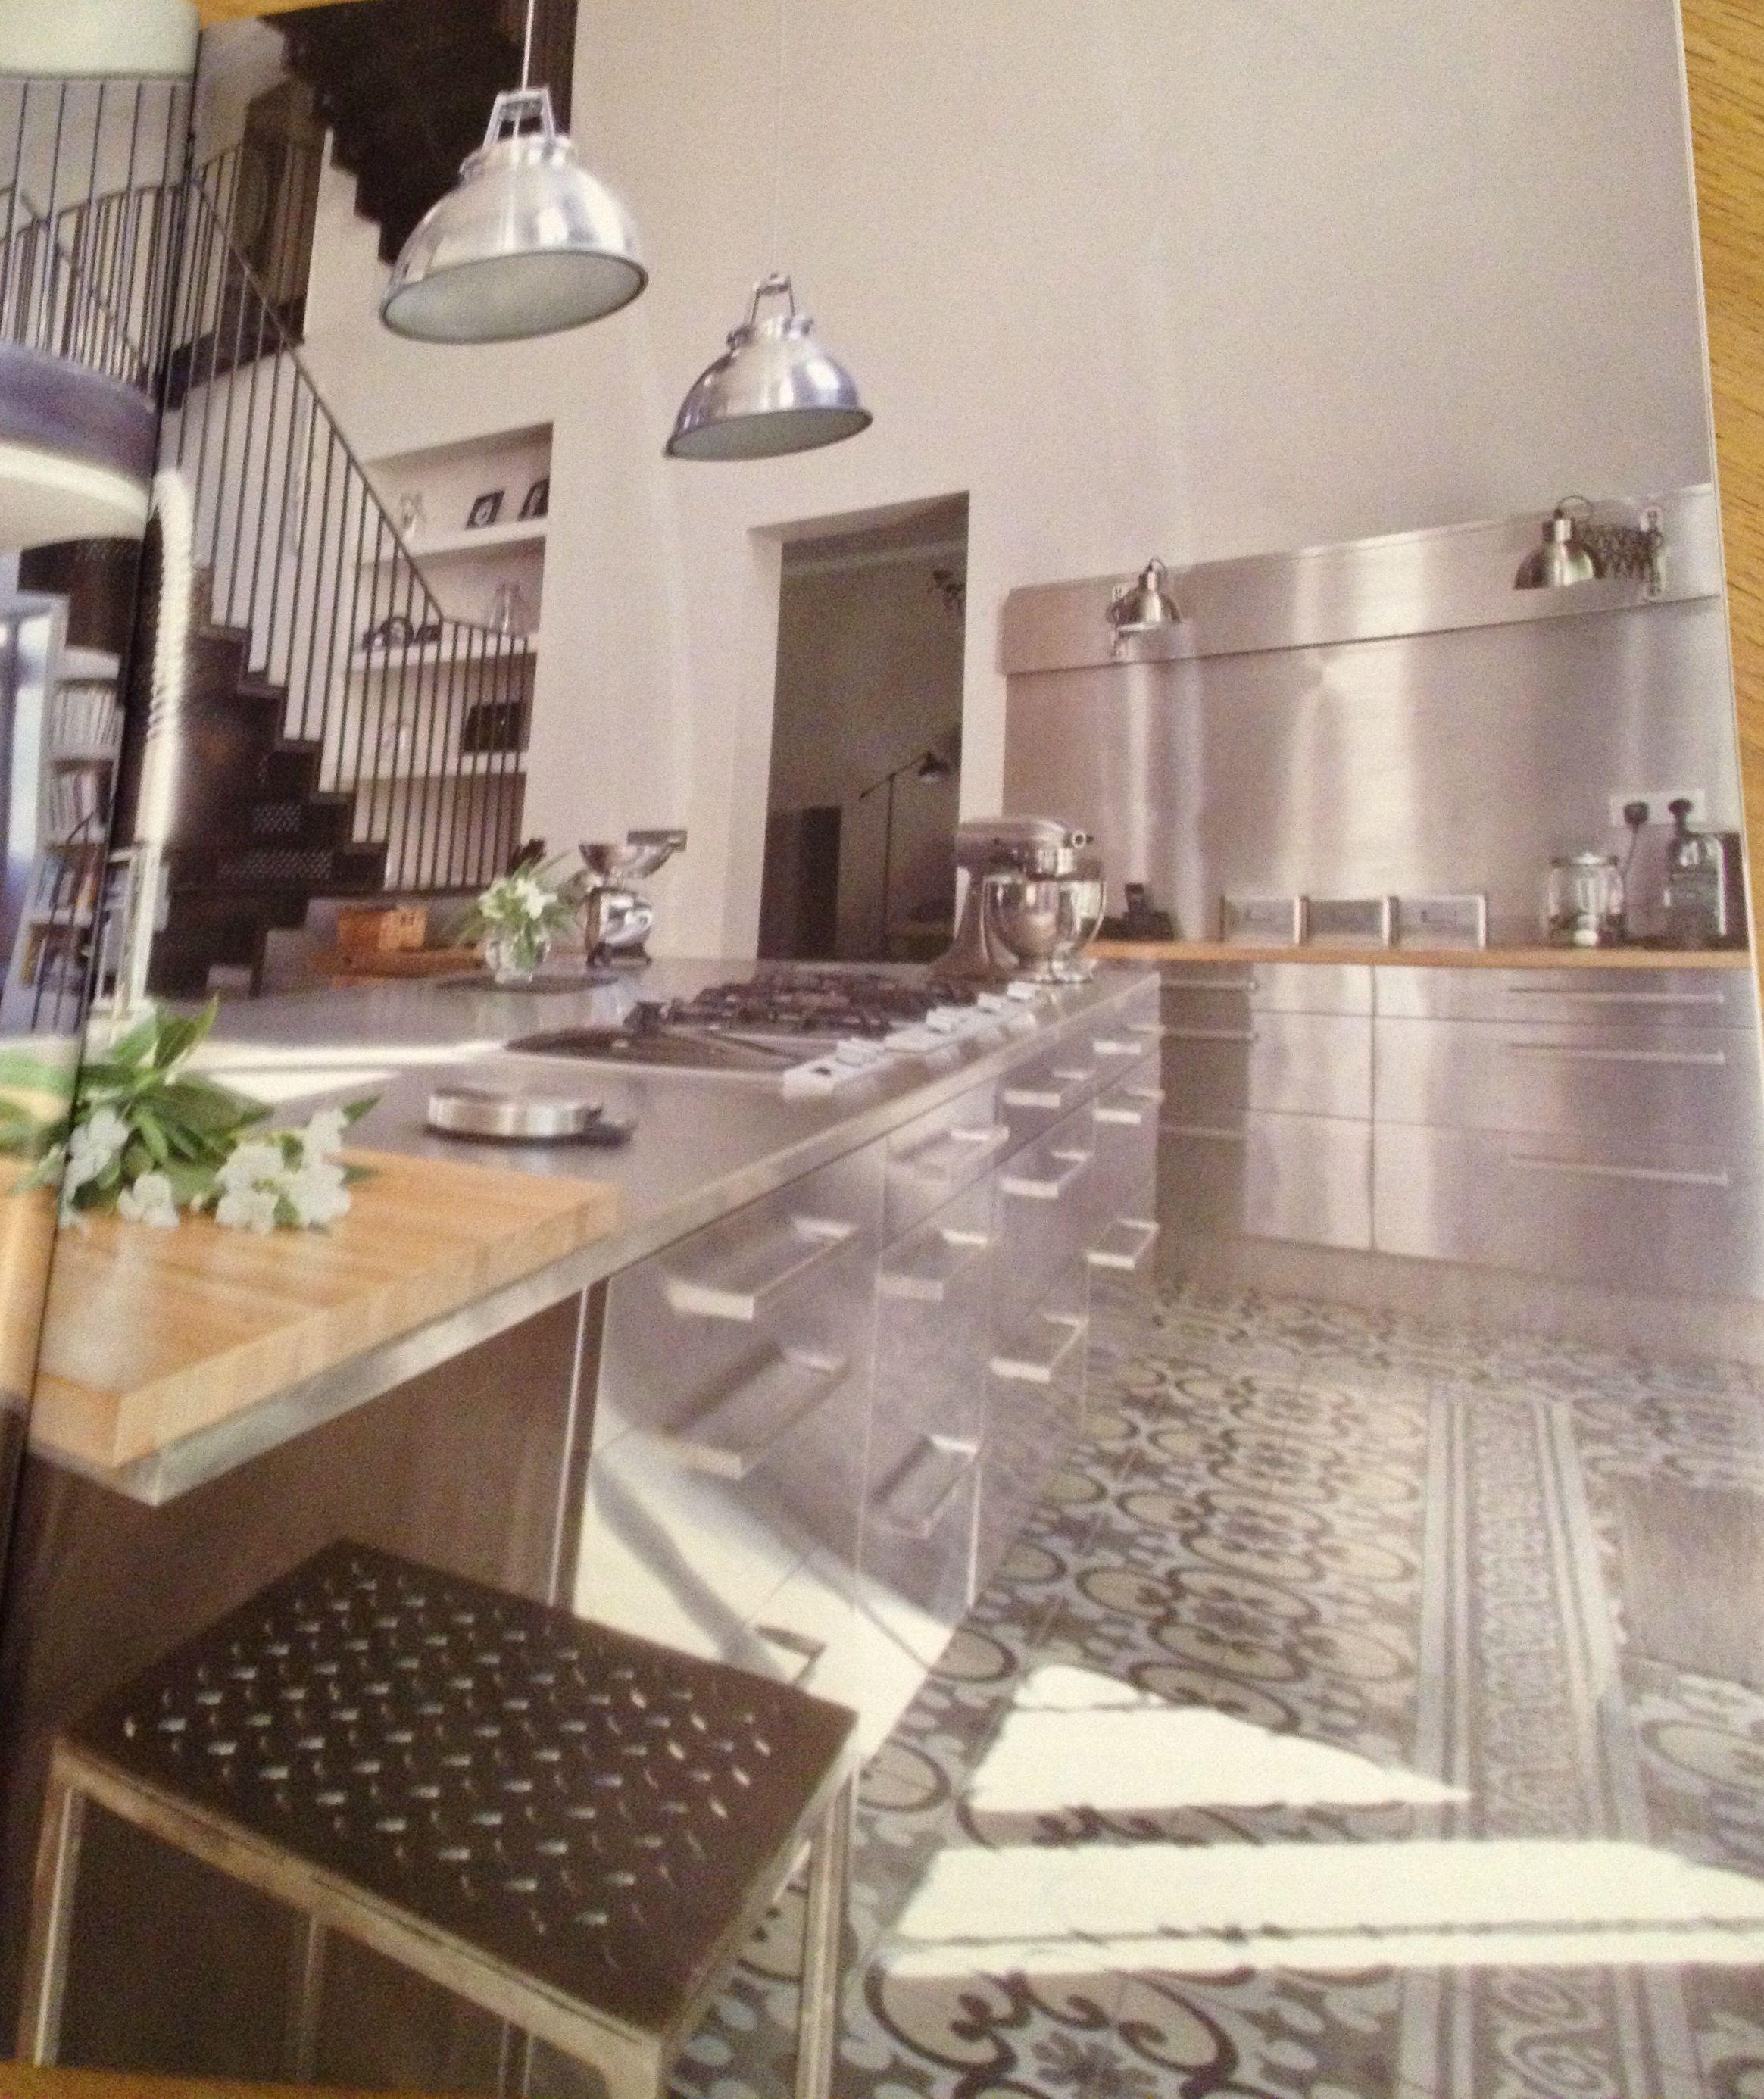 Steel ikea kitchen with portuguese tile floor utterly sublime steel ikea kitchen with portuguese tile floor utterly sublime and under floor heating to doublecrazyfo Choice Image